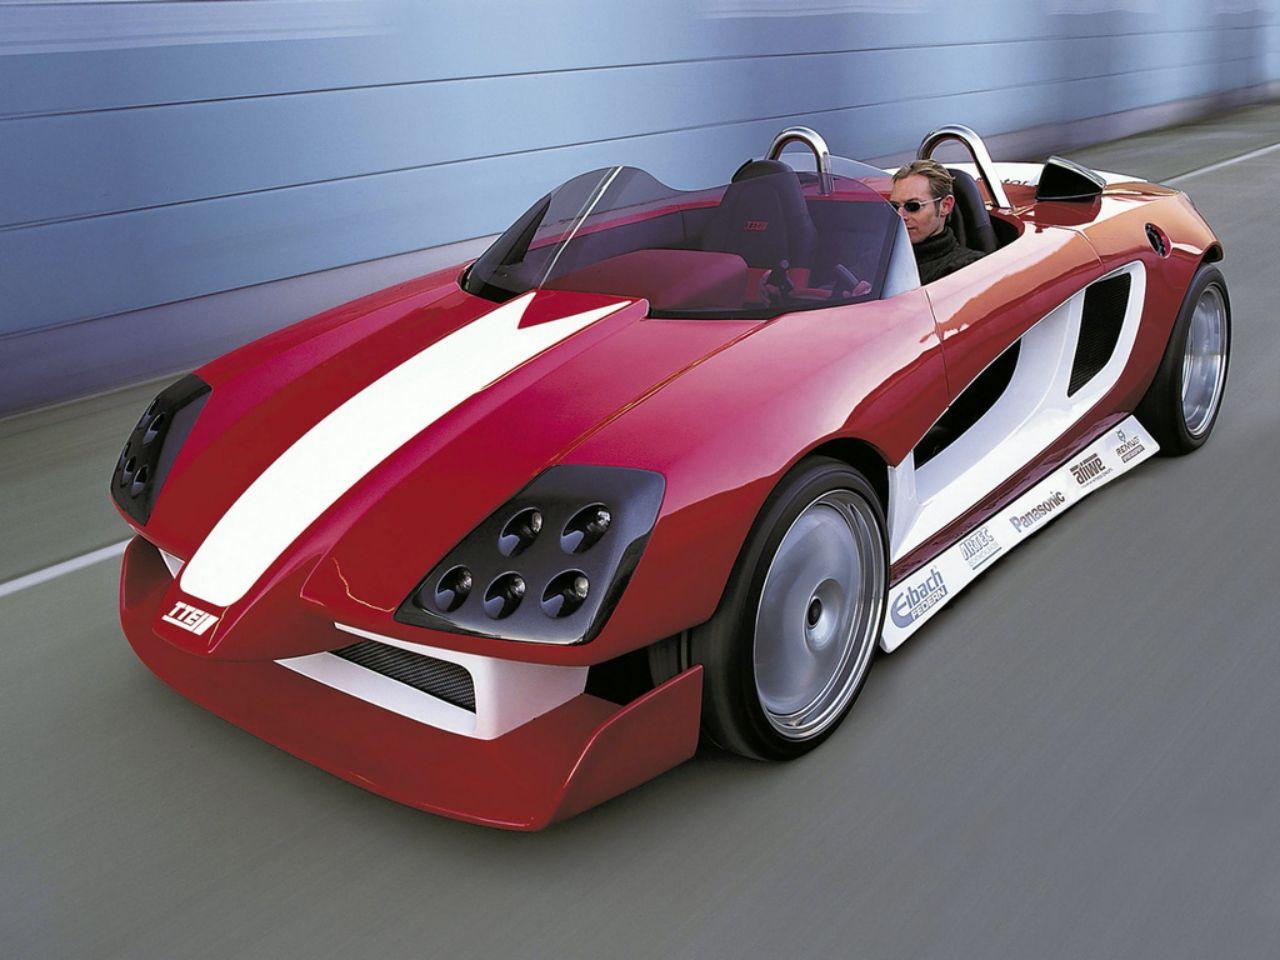 Toyota-MR2-Street-Affair-Concept-1